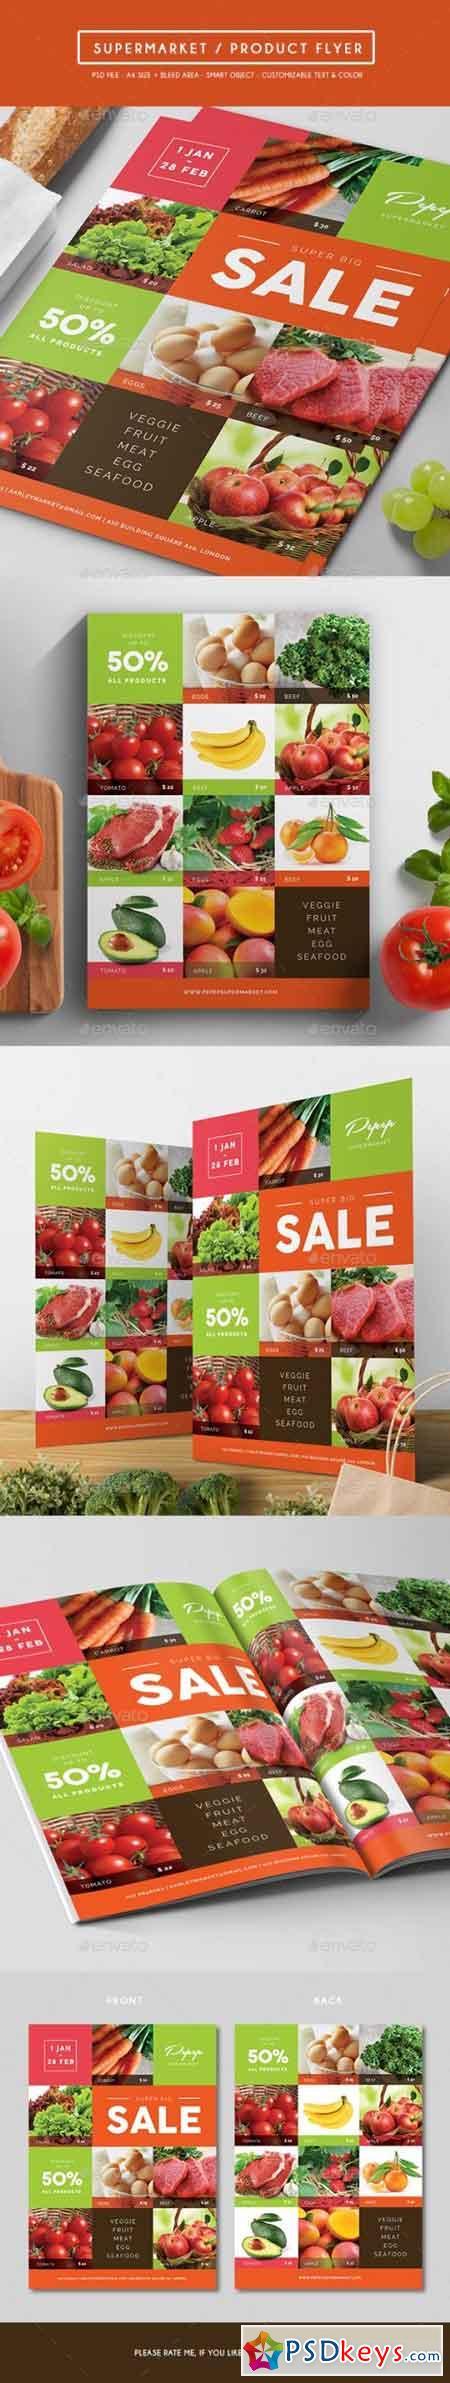 Supermarket Product Flyer 15914834